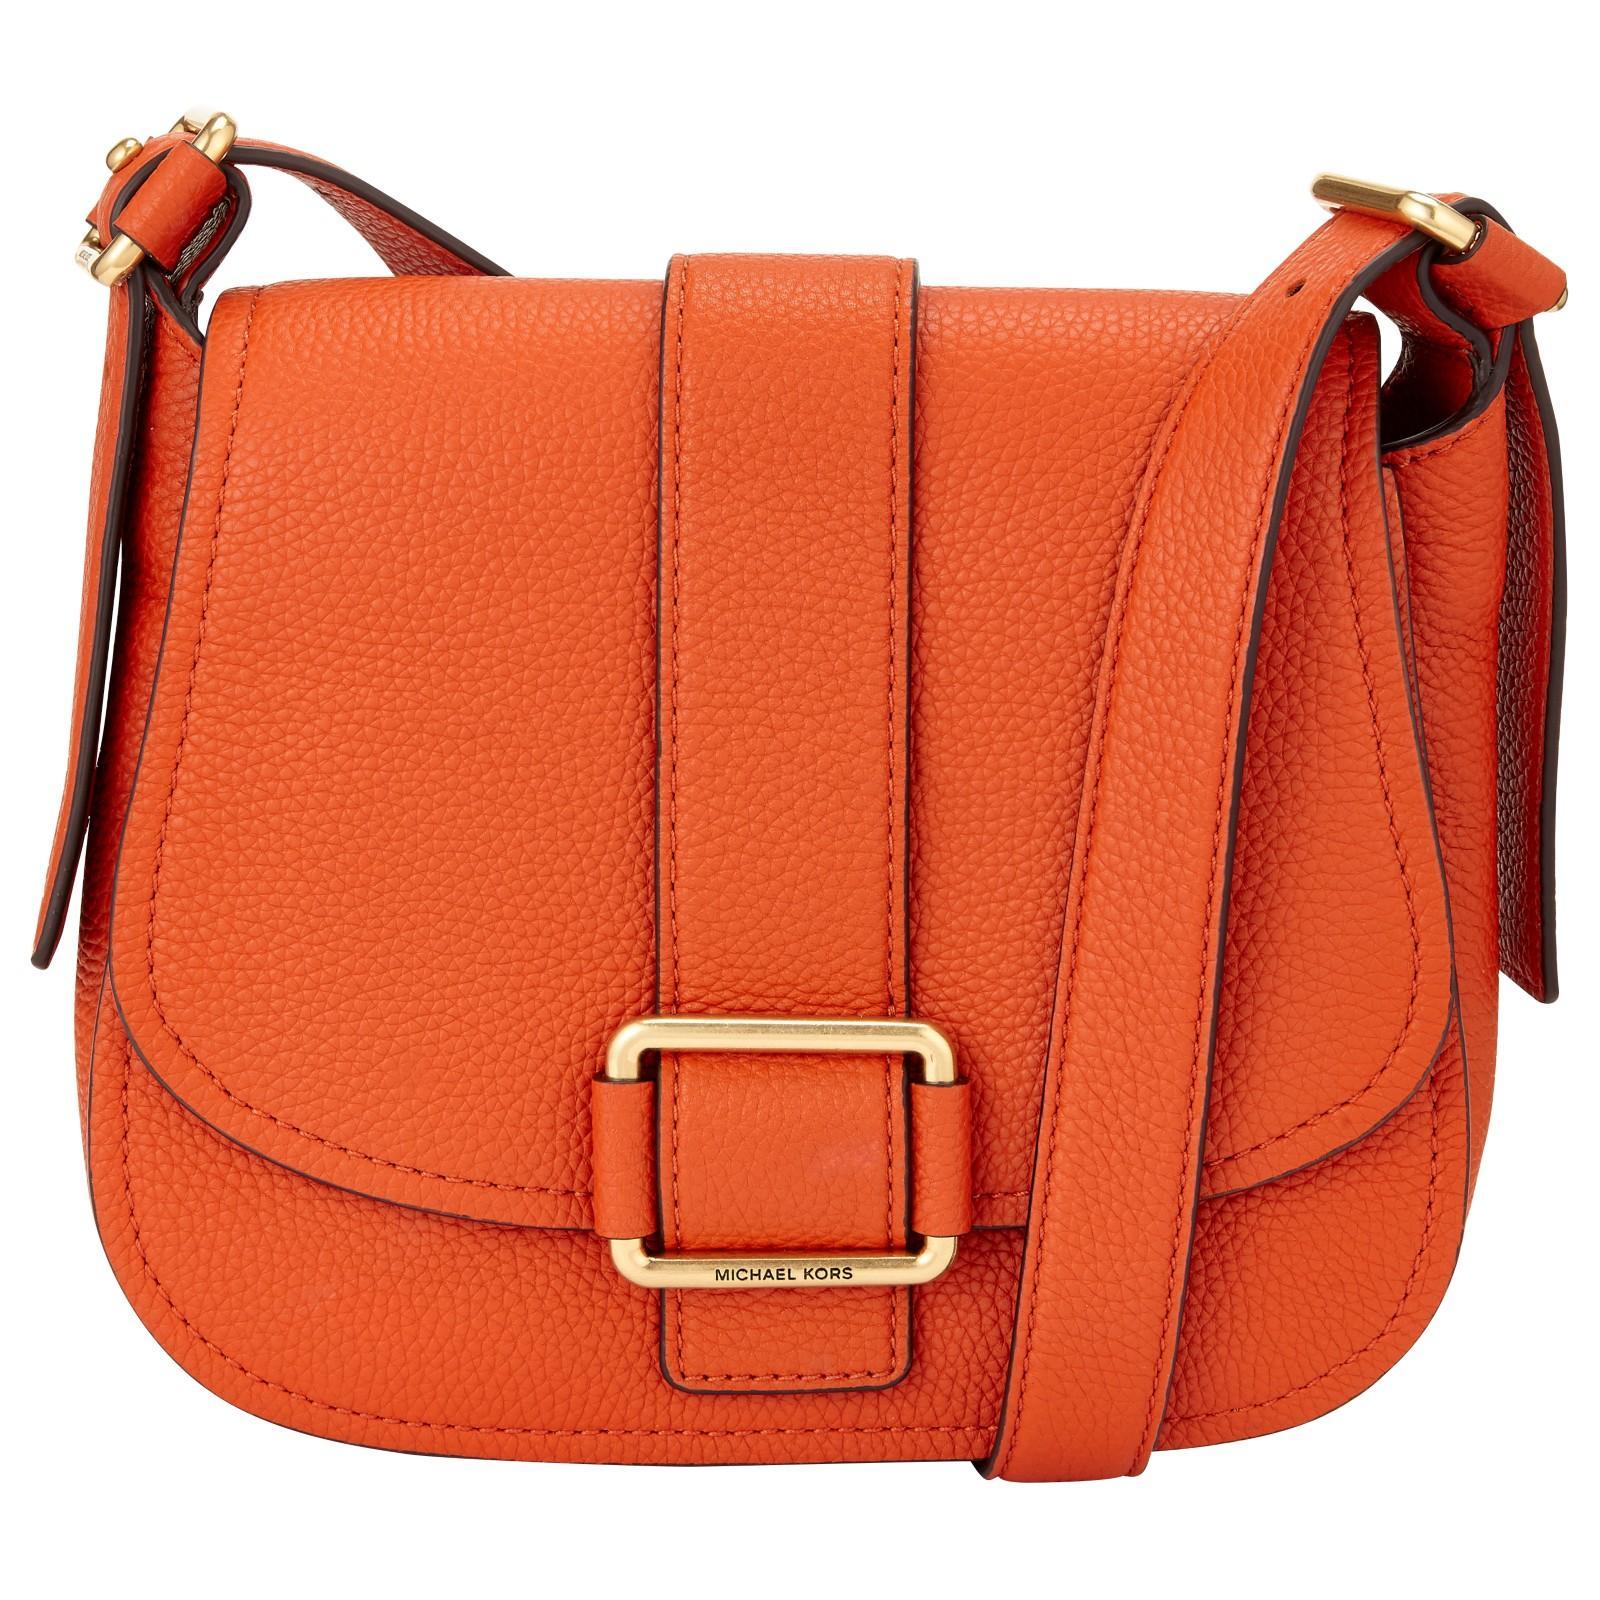 302545a77204 Michael Michael Kors Maxine Large Leather Across Body Bag in Orange ...